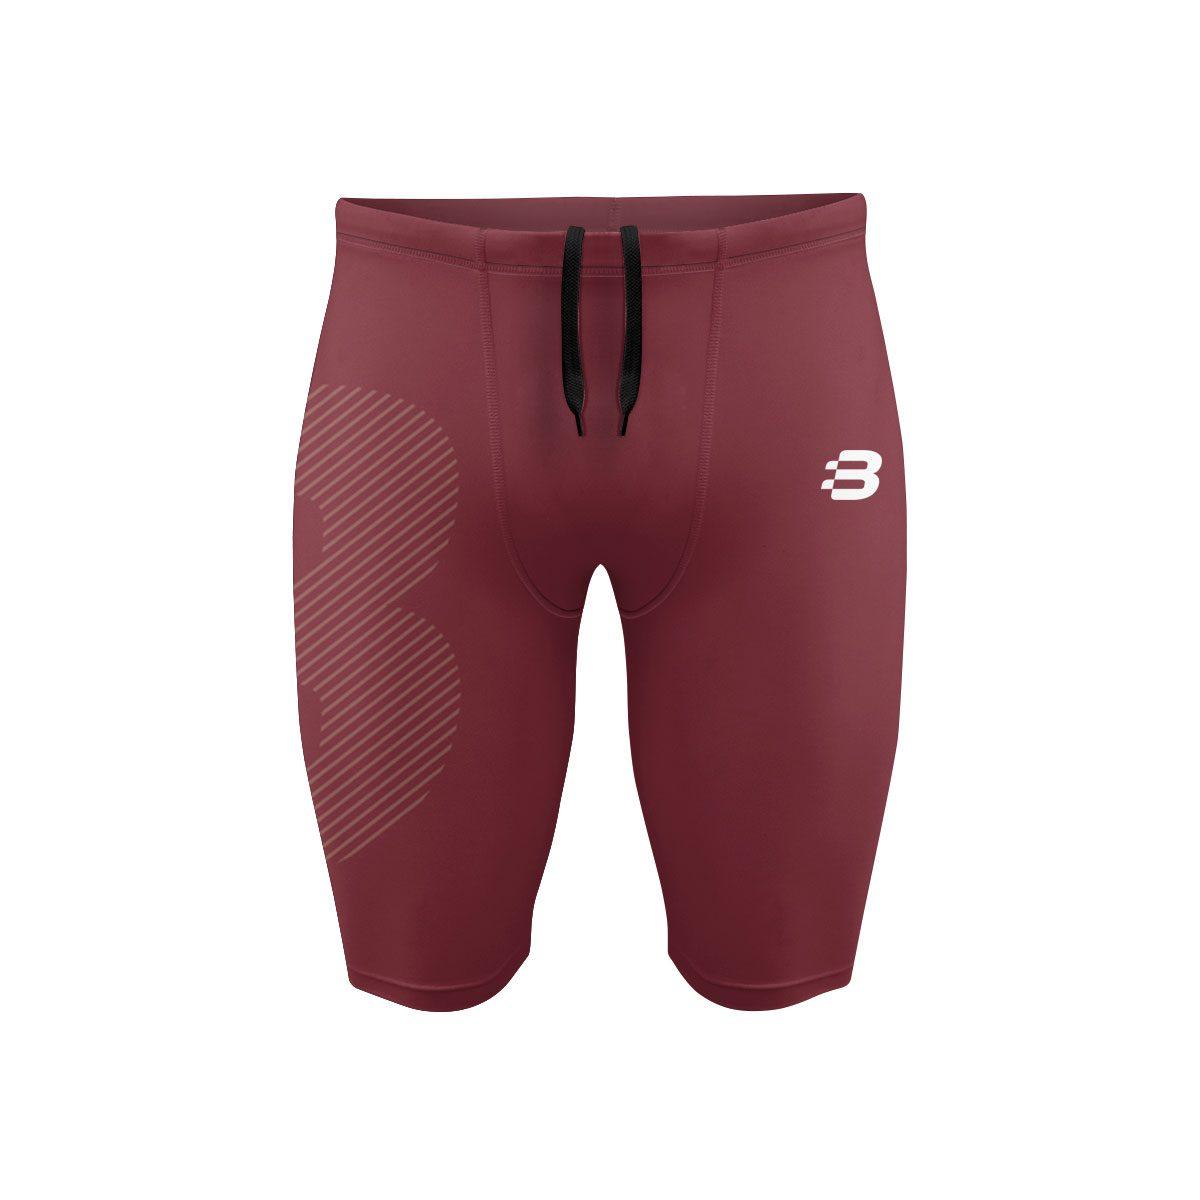 Mens Compression Shorts - Light Maroon